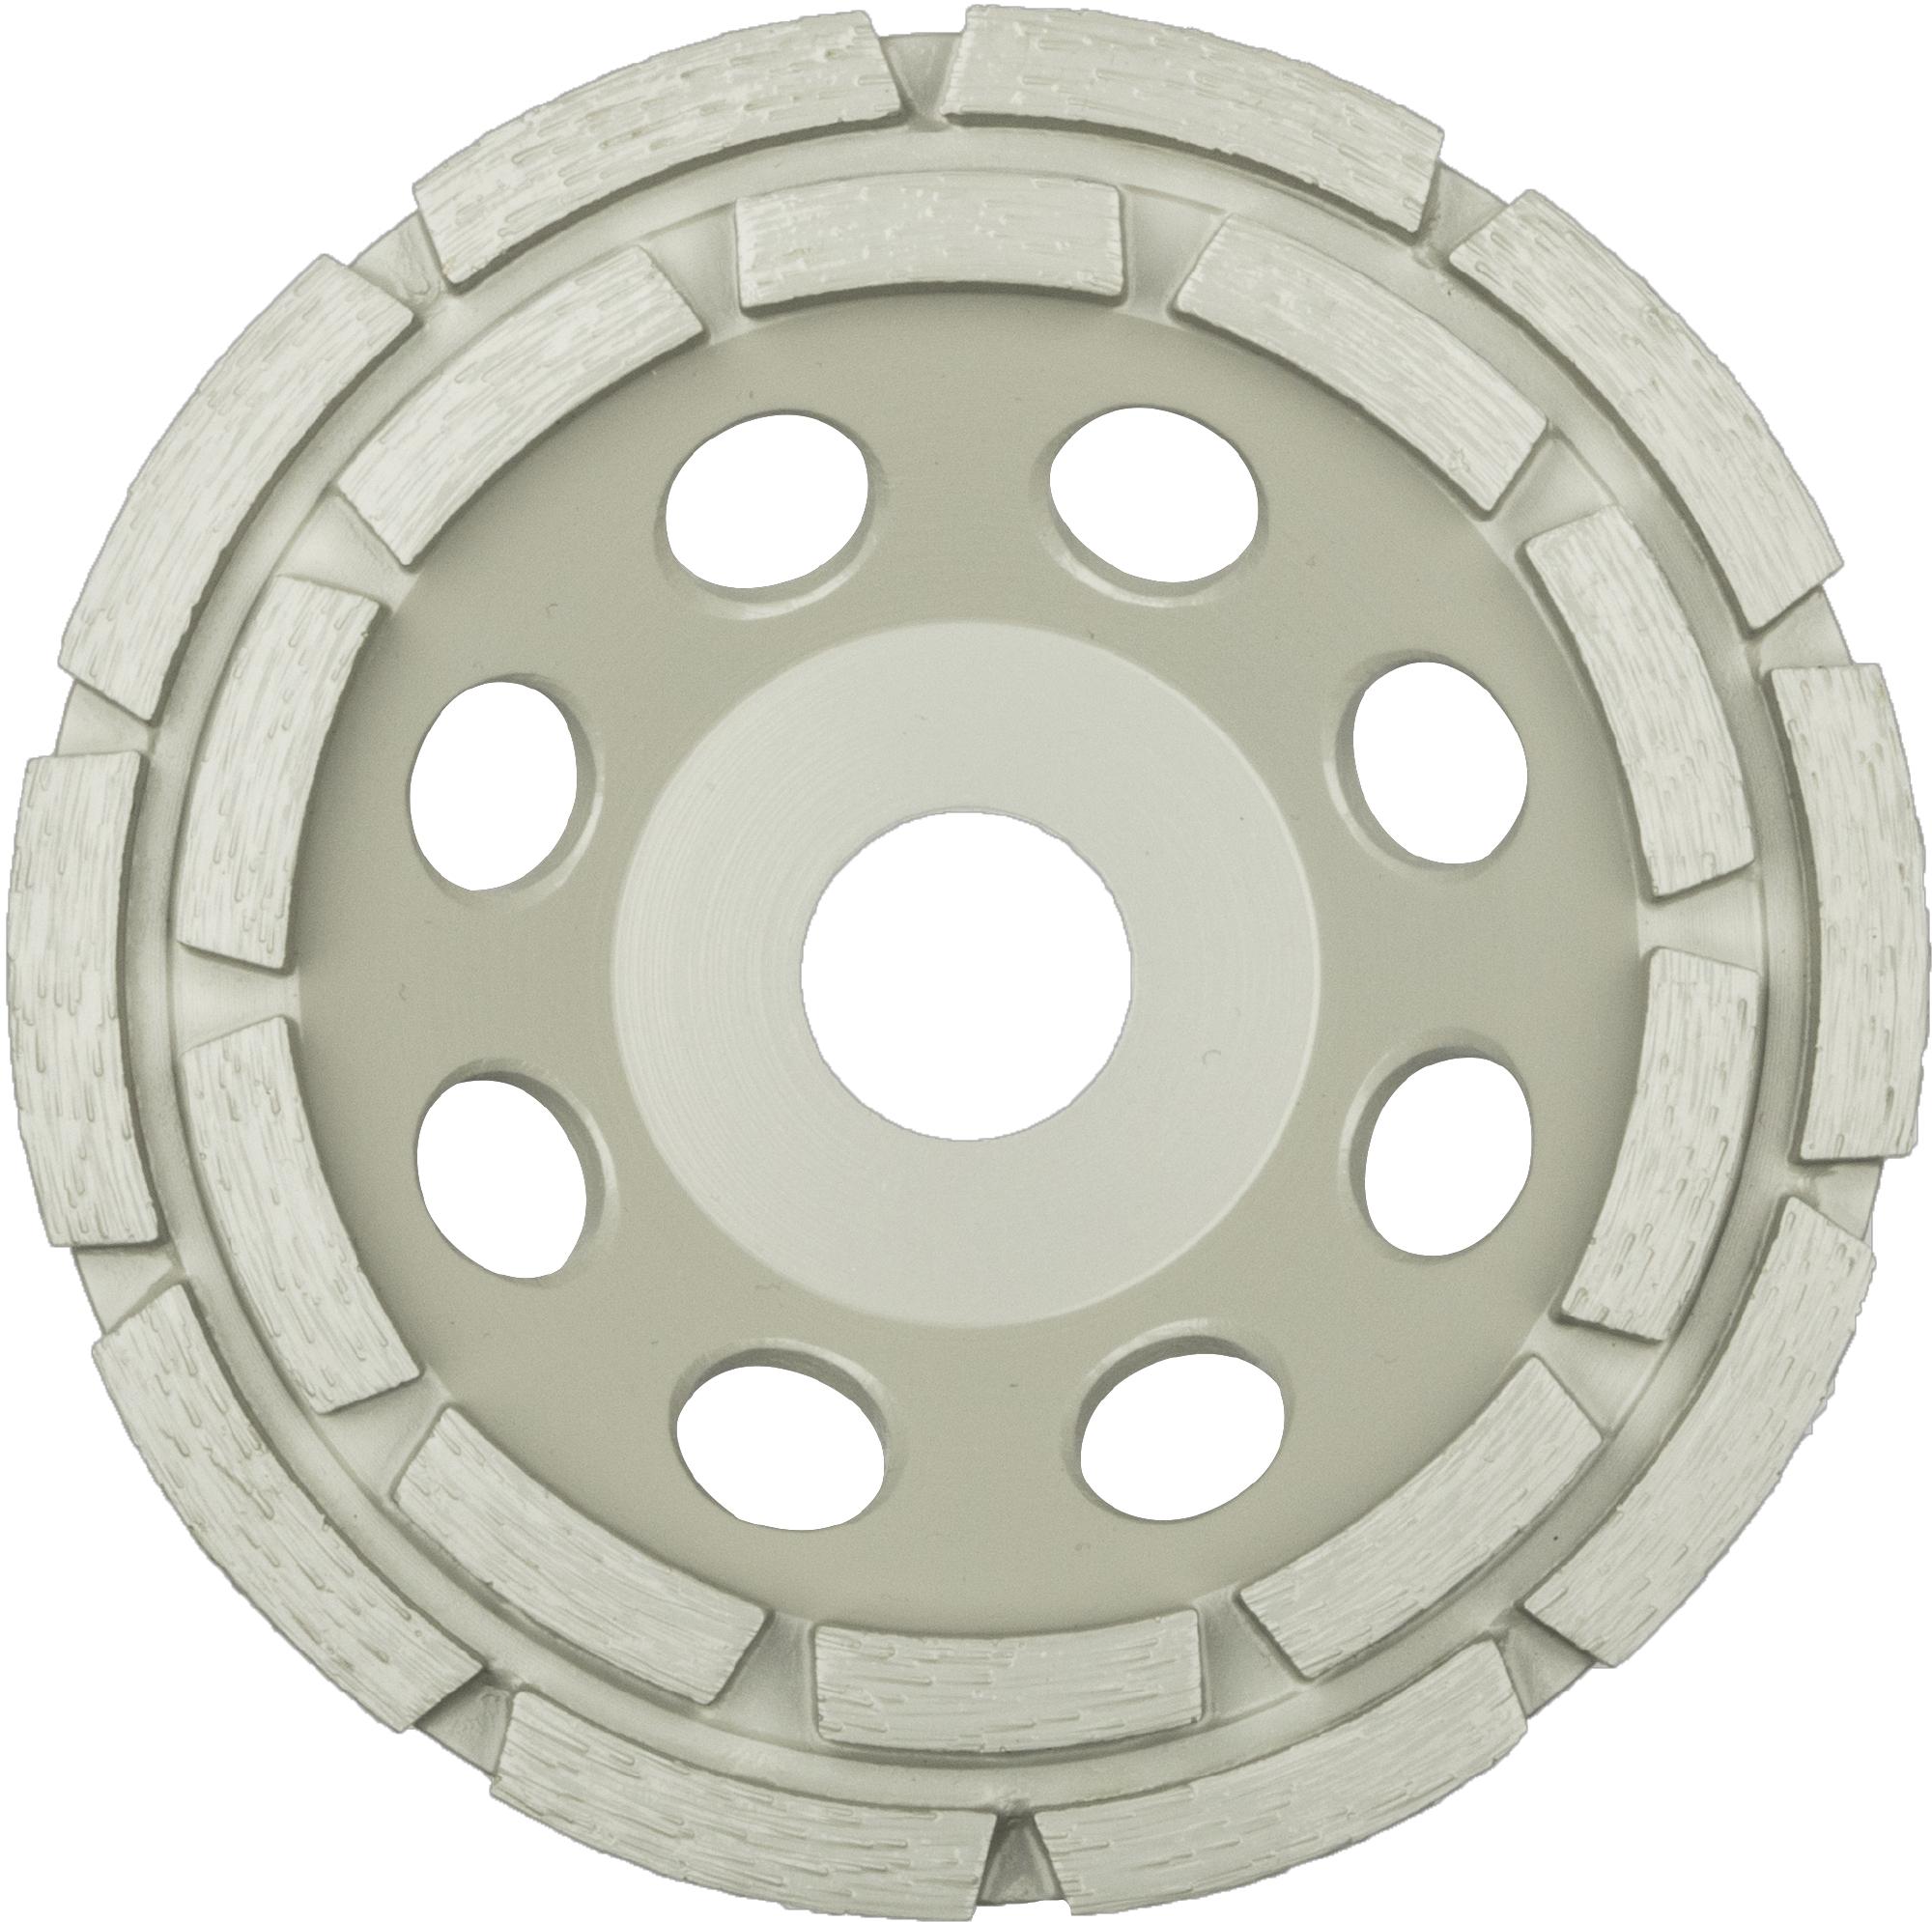 Klingspor DS 300 B Diamantschleifteller, 100 x 7 x 22,23 mm 14 Segmente 7 x 5,5 mm, 2-Reihig | 330622